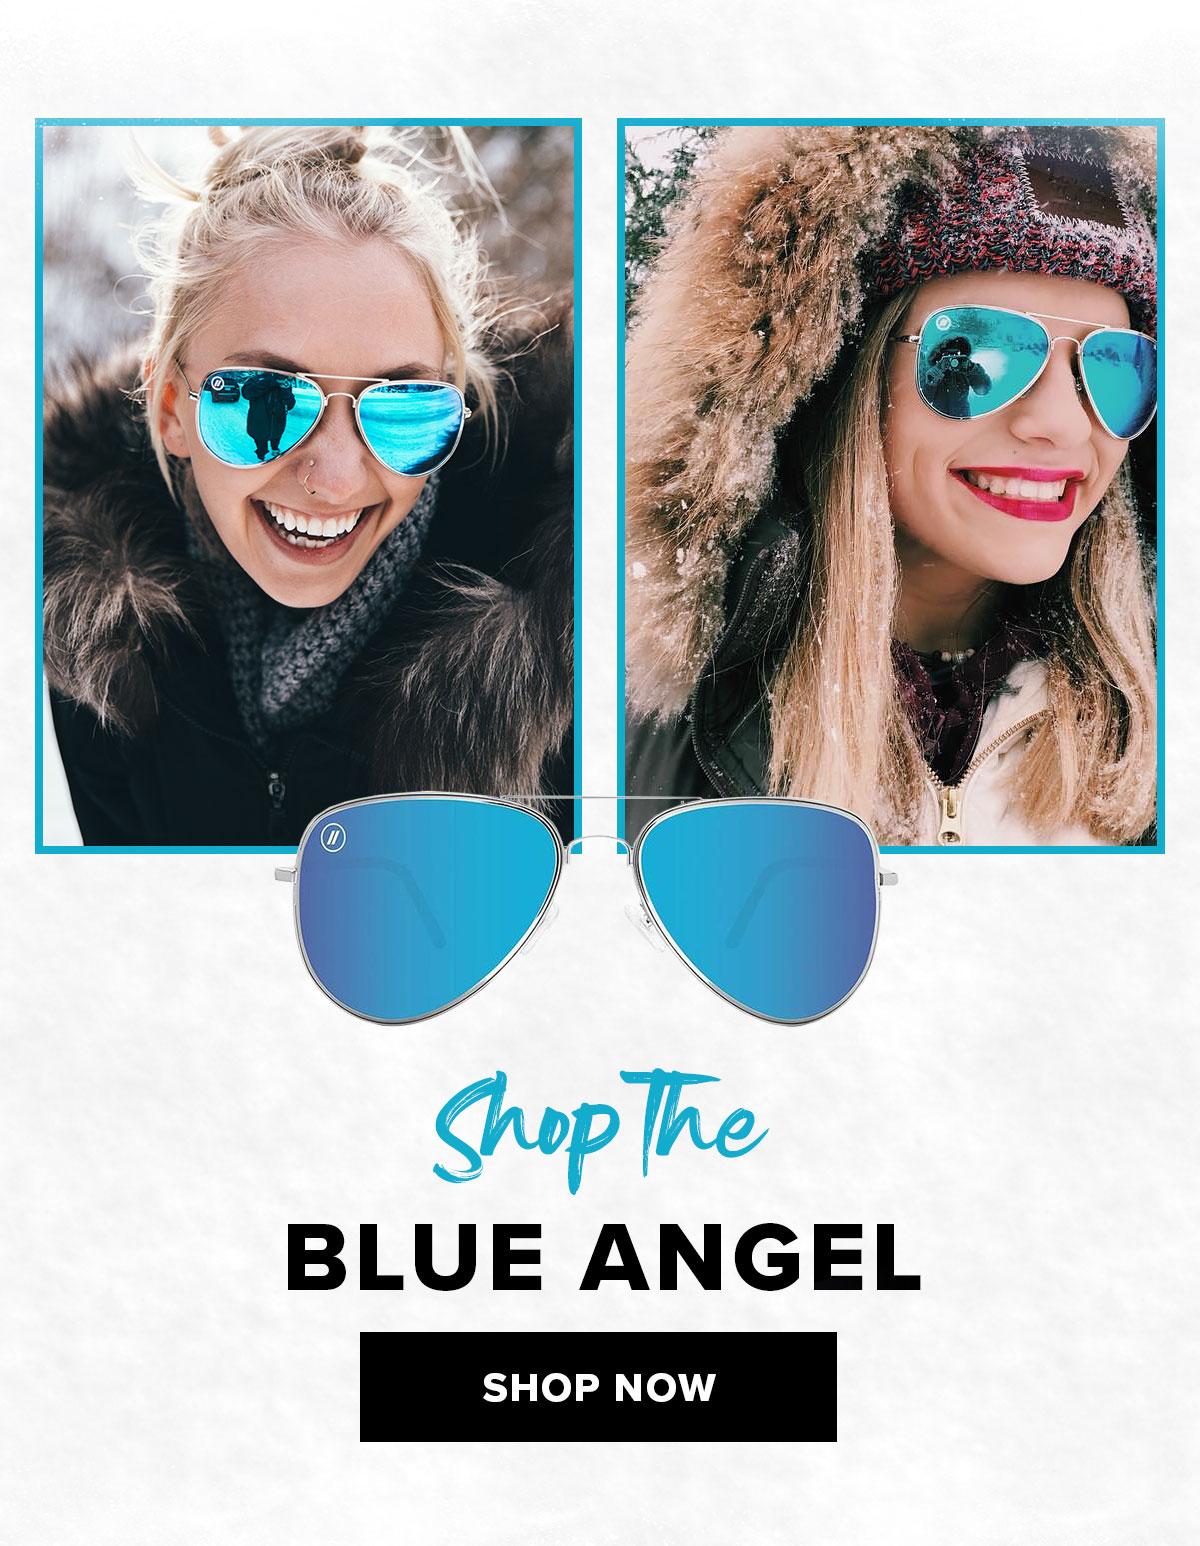 89f3246c45e Shop the BLUE ANGEL